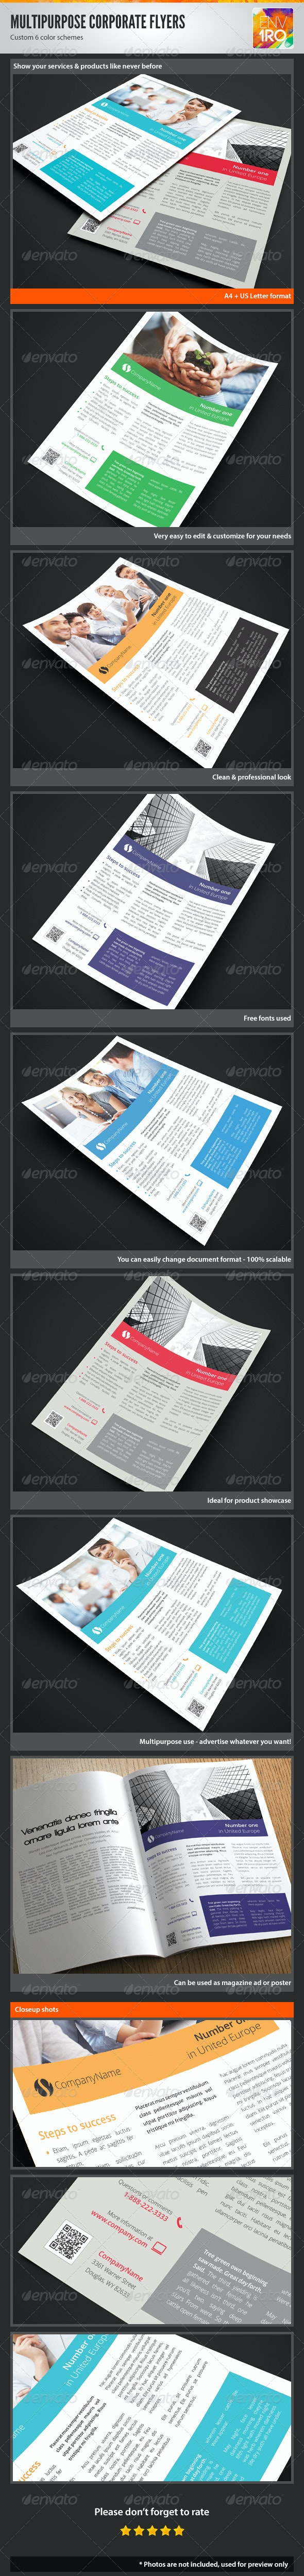 Multipurpose Corporate Flyers, Magazine Ads vol. 7 - Corporate Flyers